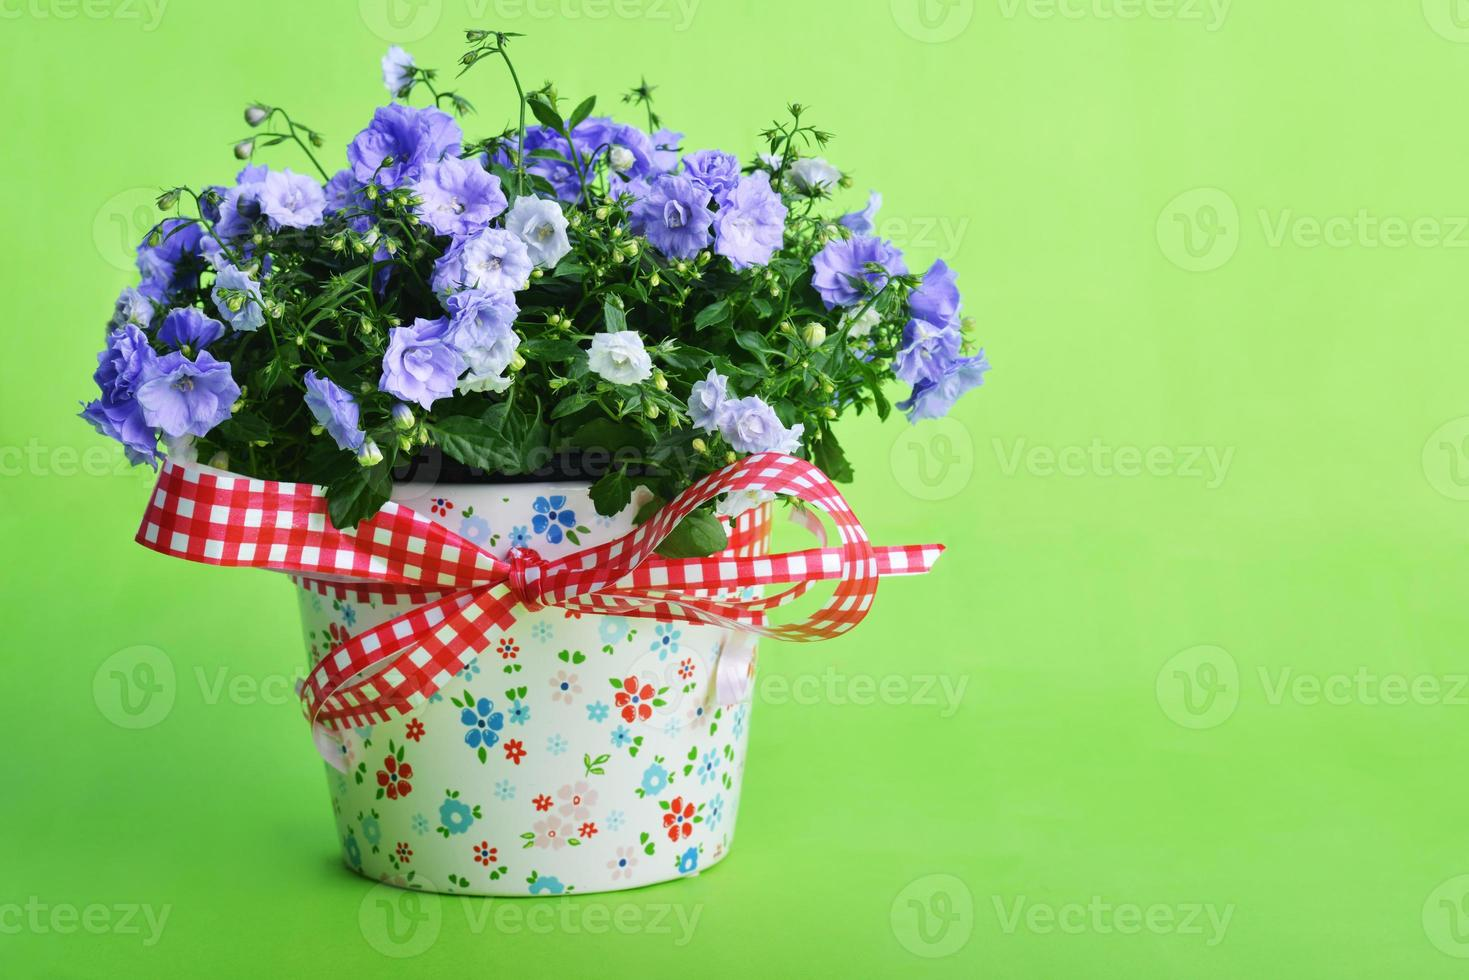 flores de campânula foto